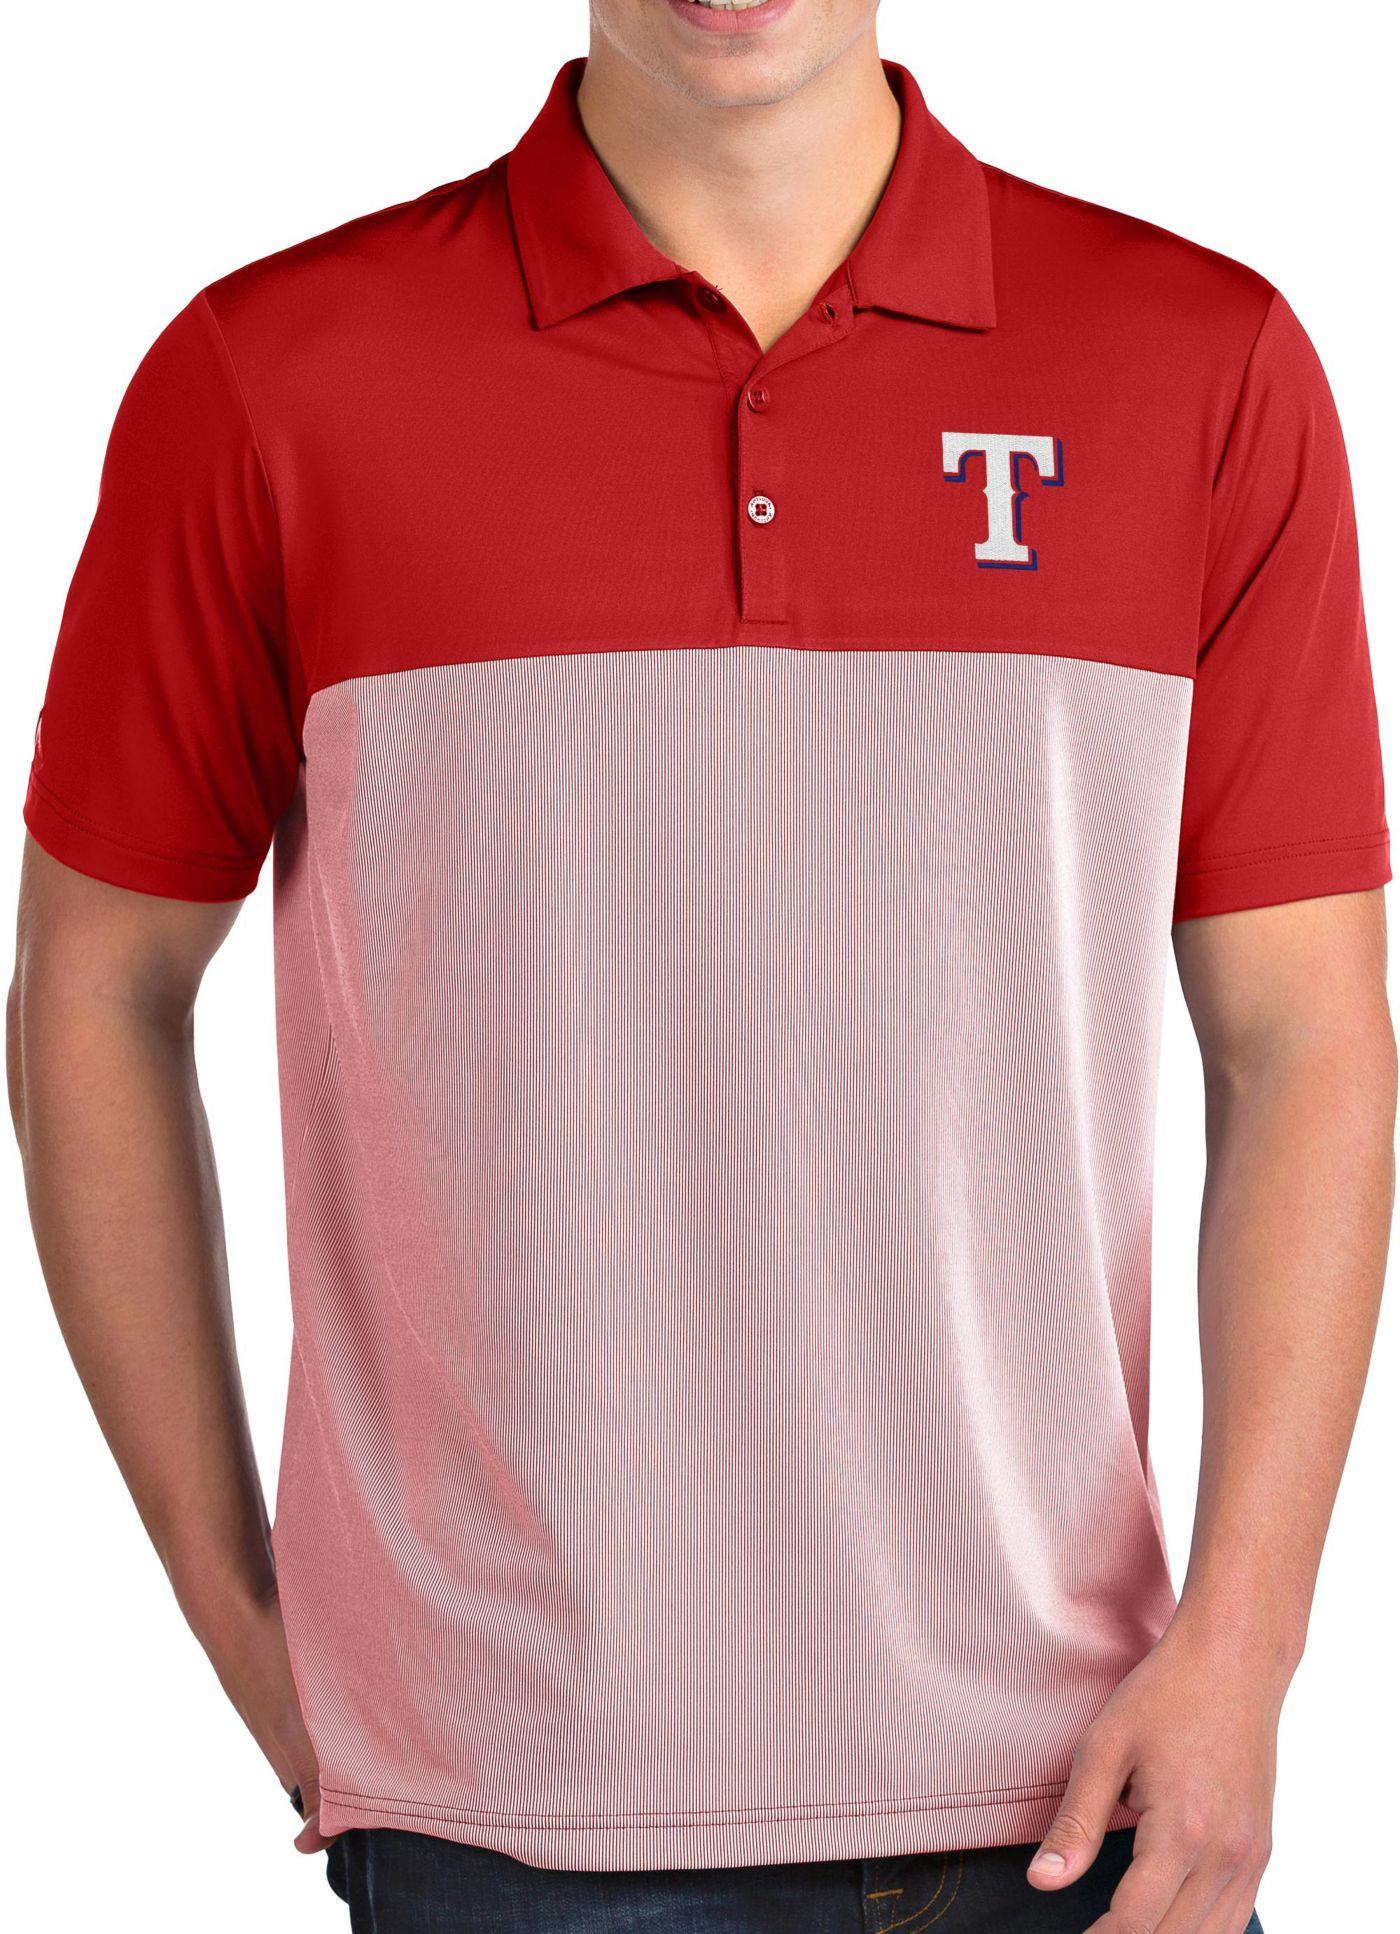 Antigua Men's Texas Rangers Venture Red Performance Polo